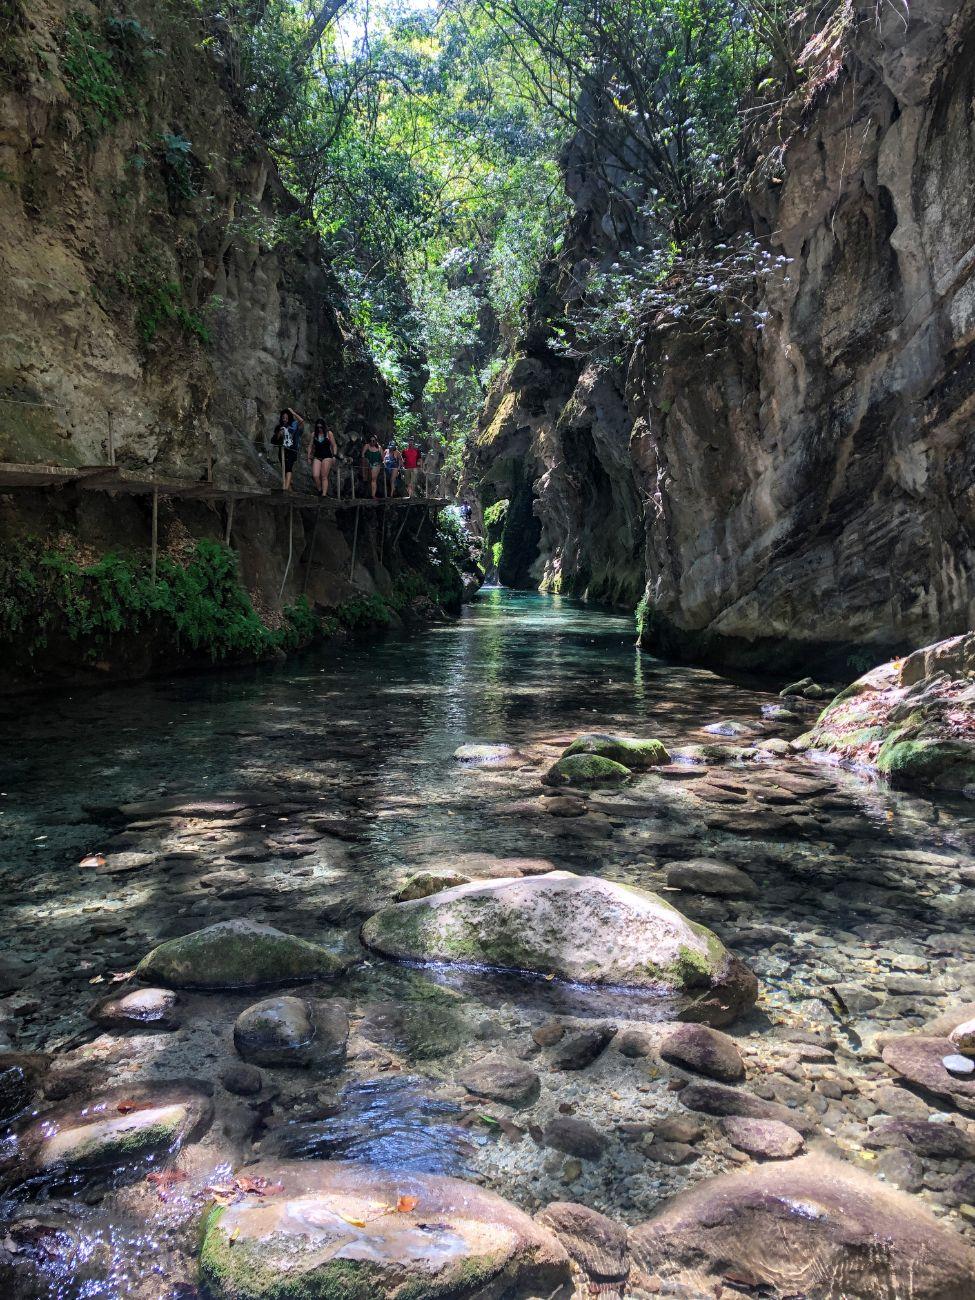 Hiking to the Puente de Dios waterfall in Sierra Gorda